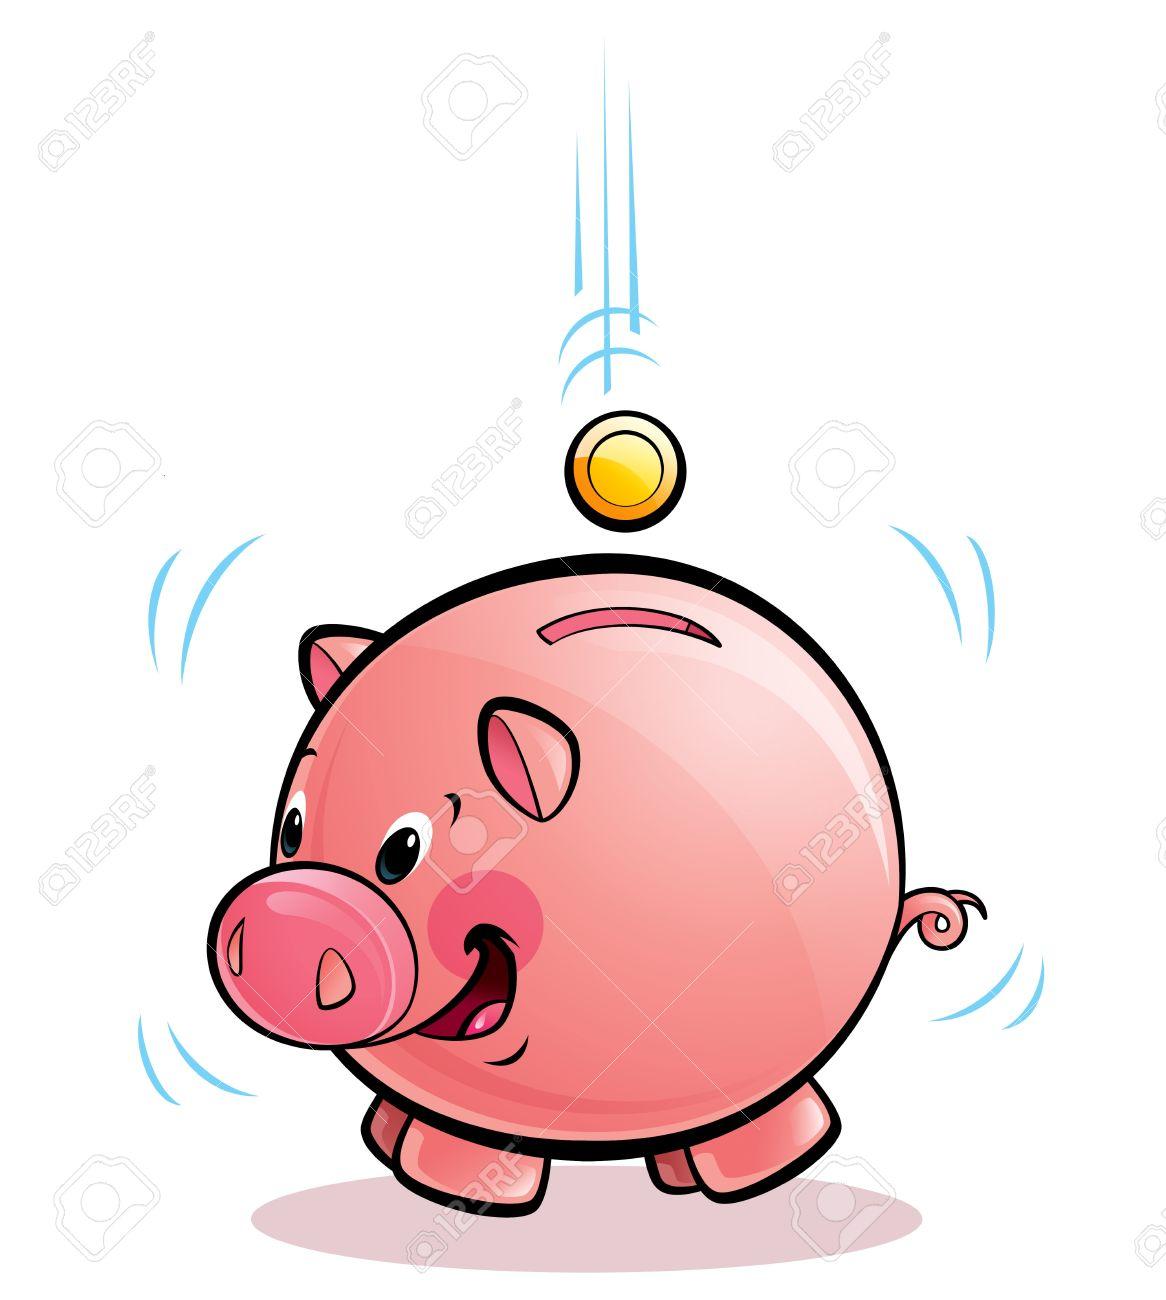 Box clipart cartoon. Money clipground a pig